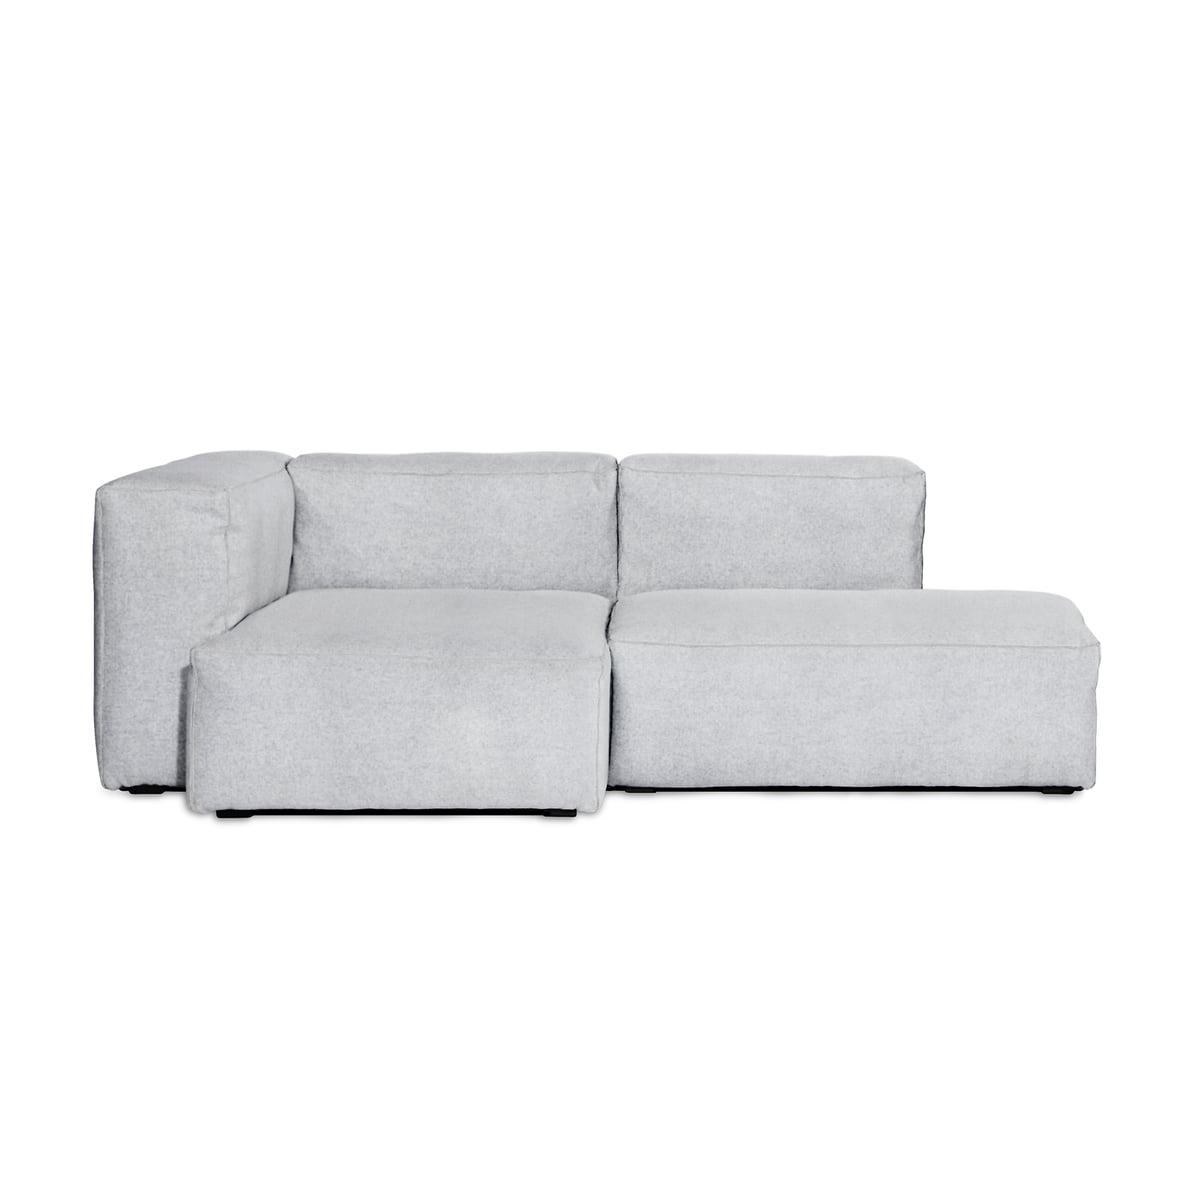 Hay mags soft sofa 2 5 sitzer kombination 3 hellgrau steelcut 2 120 helle naehte